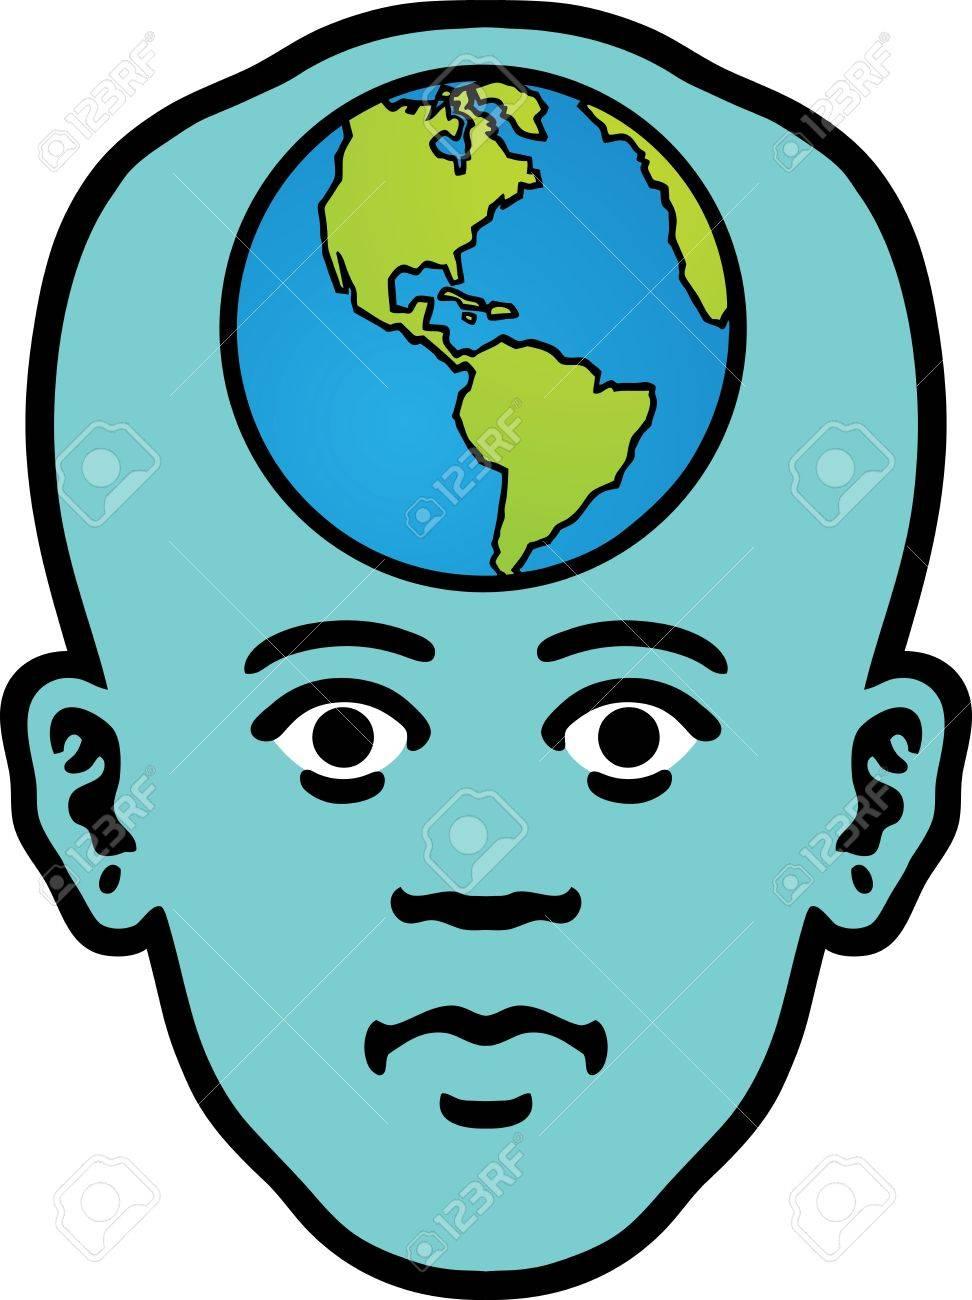 World Head Stock Vector - 12748589